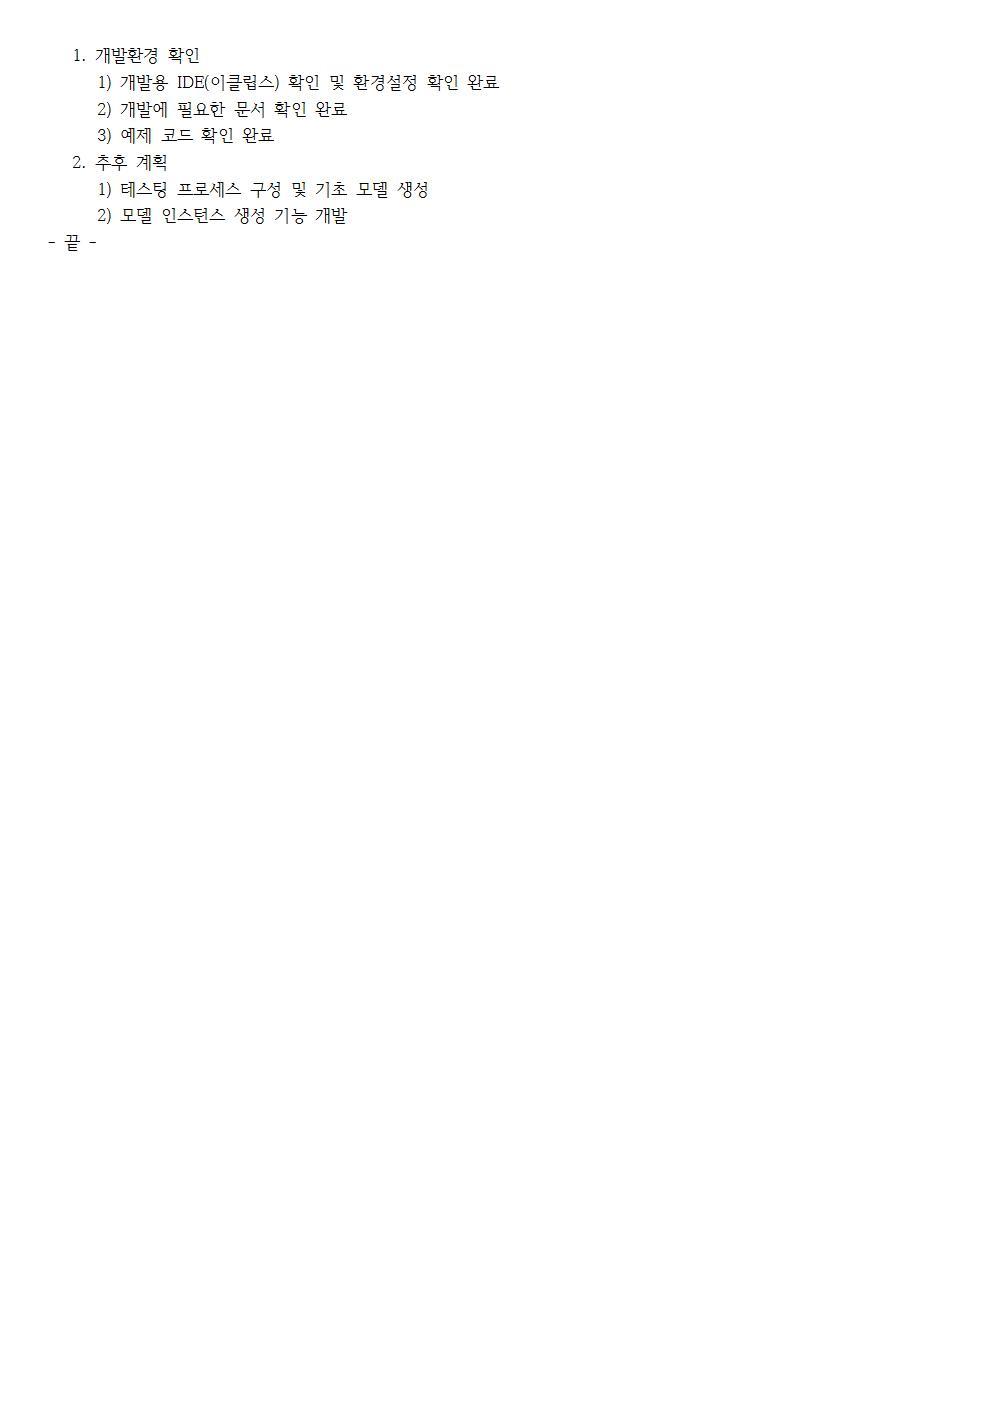 D-[18-028-BZ-03]-[KTC TMS]-[2018-01-12][YB]002.jpg